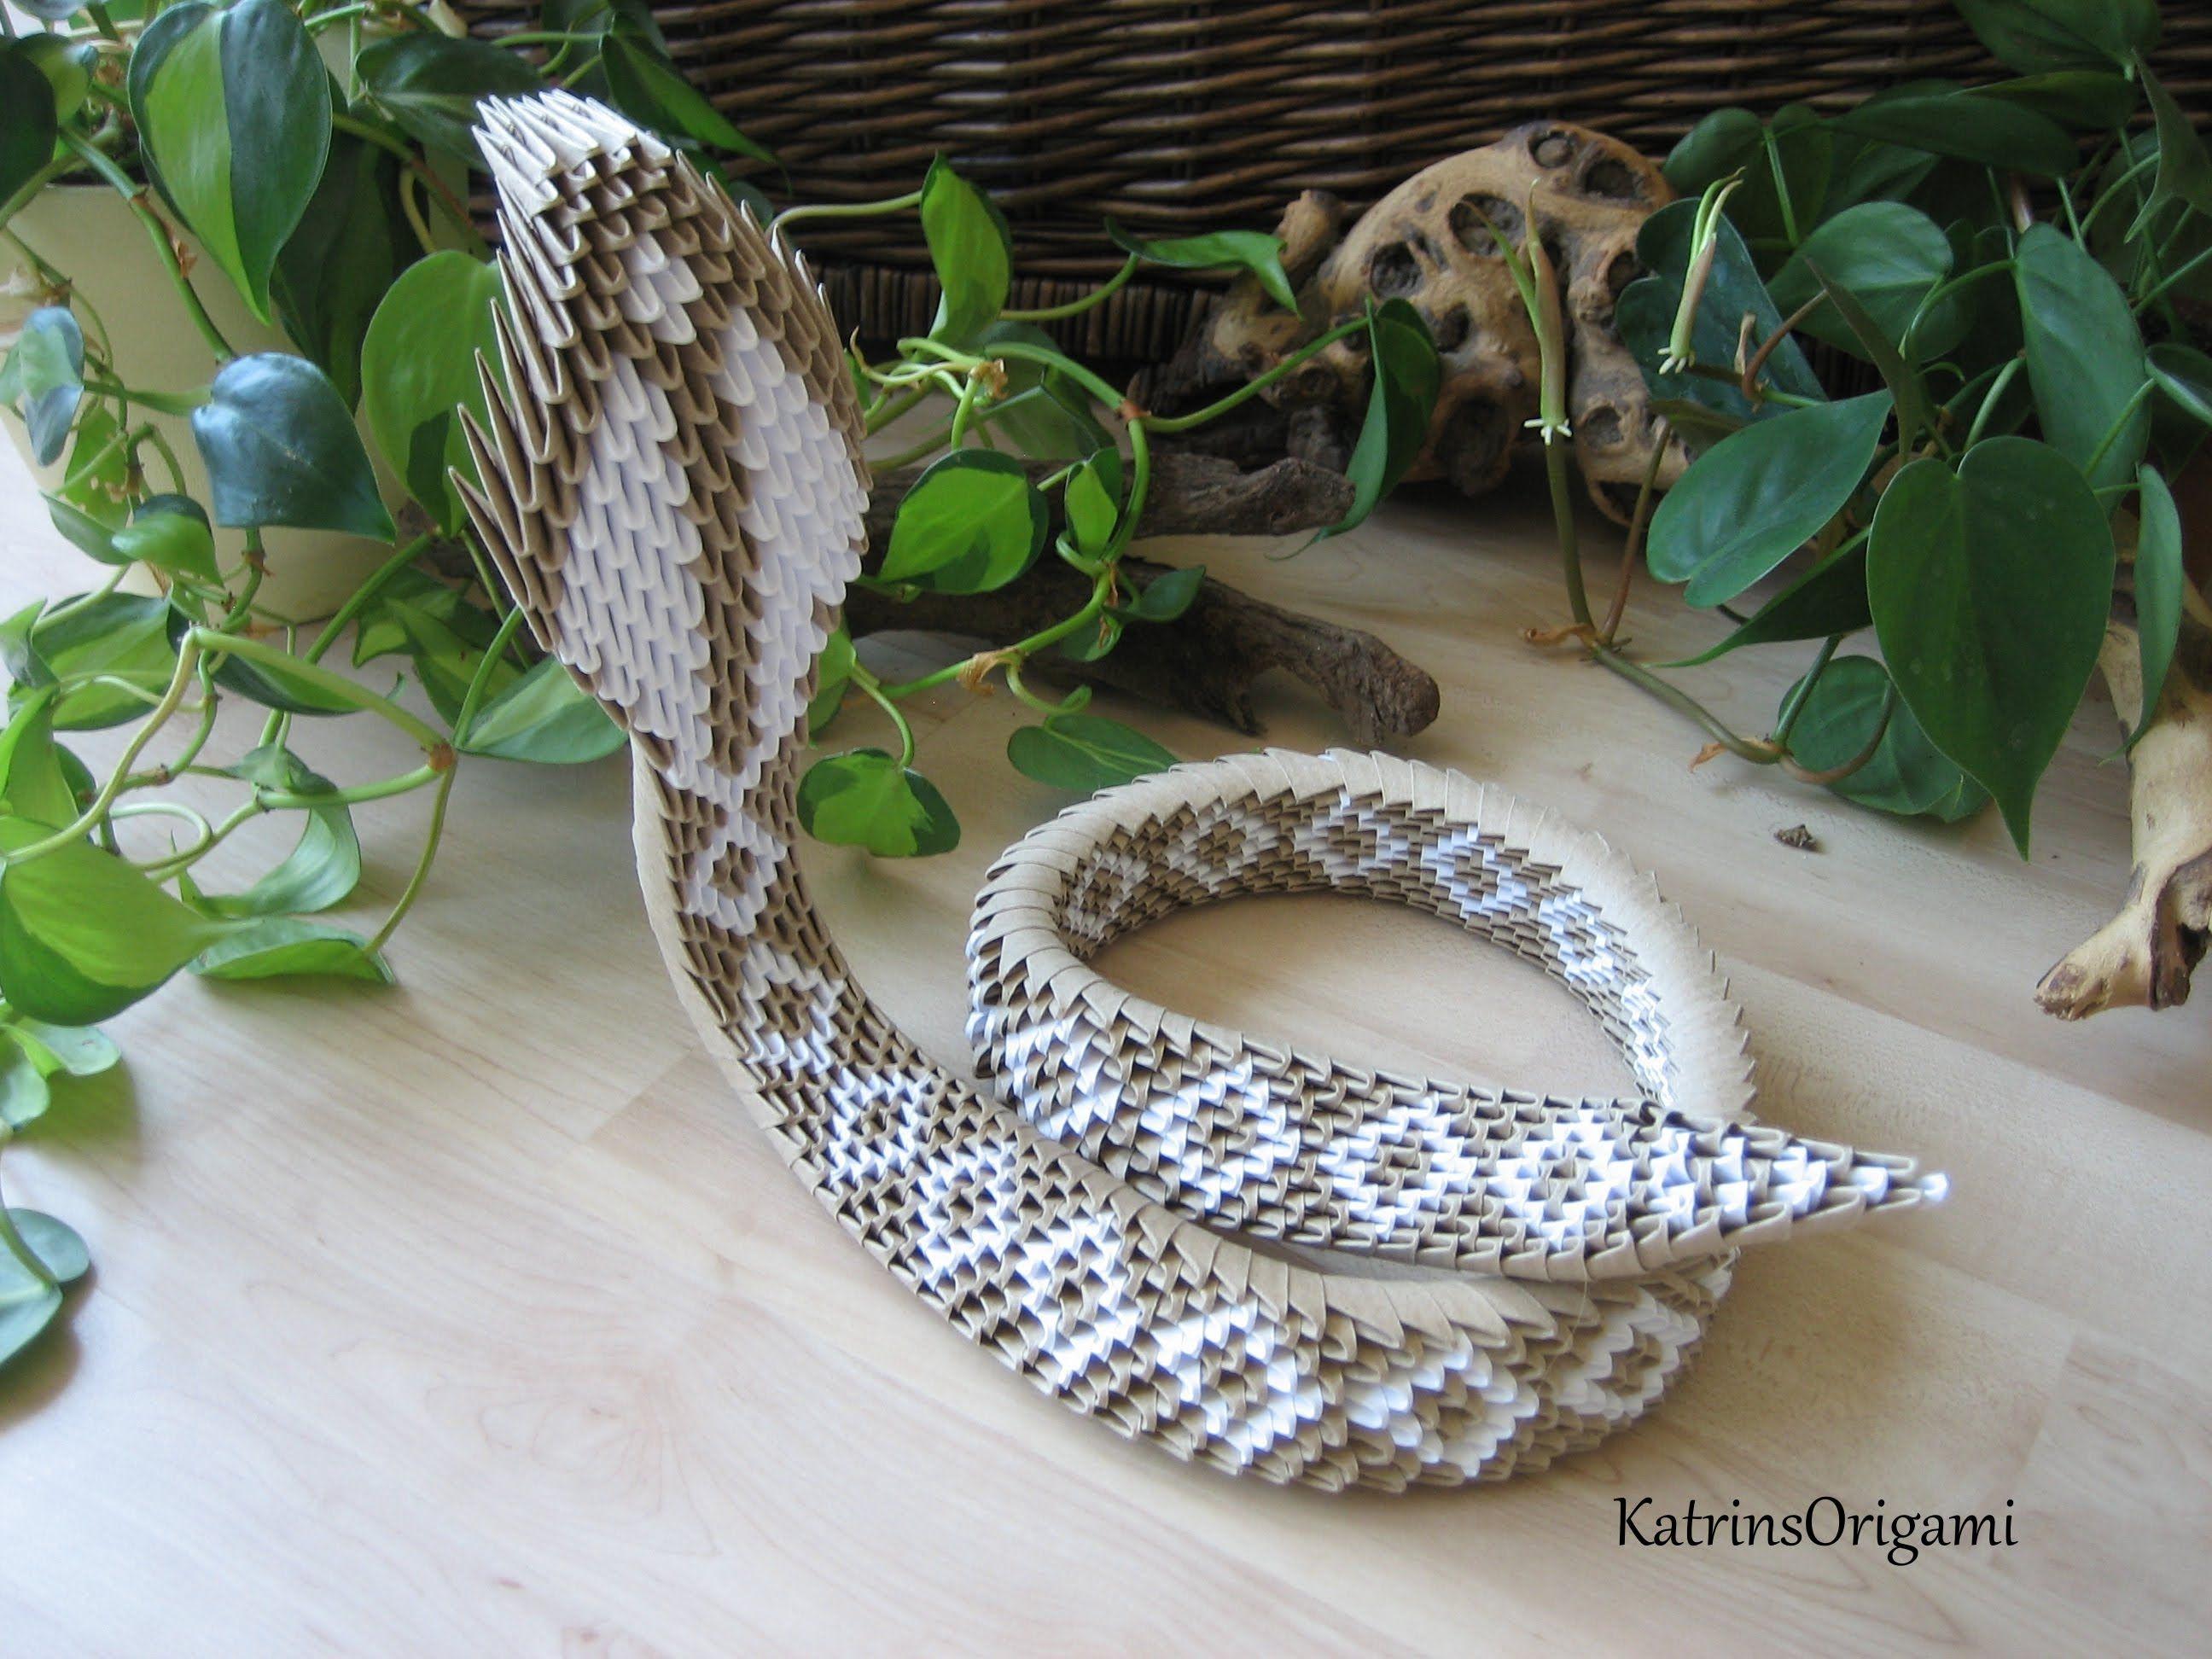 Pin by Jennifer Vanderzanden on 3D origami | Manualidades ... - photo#26